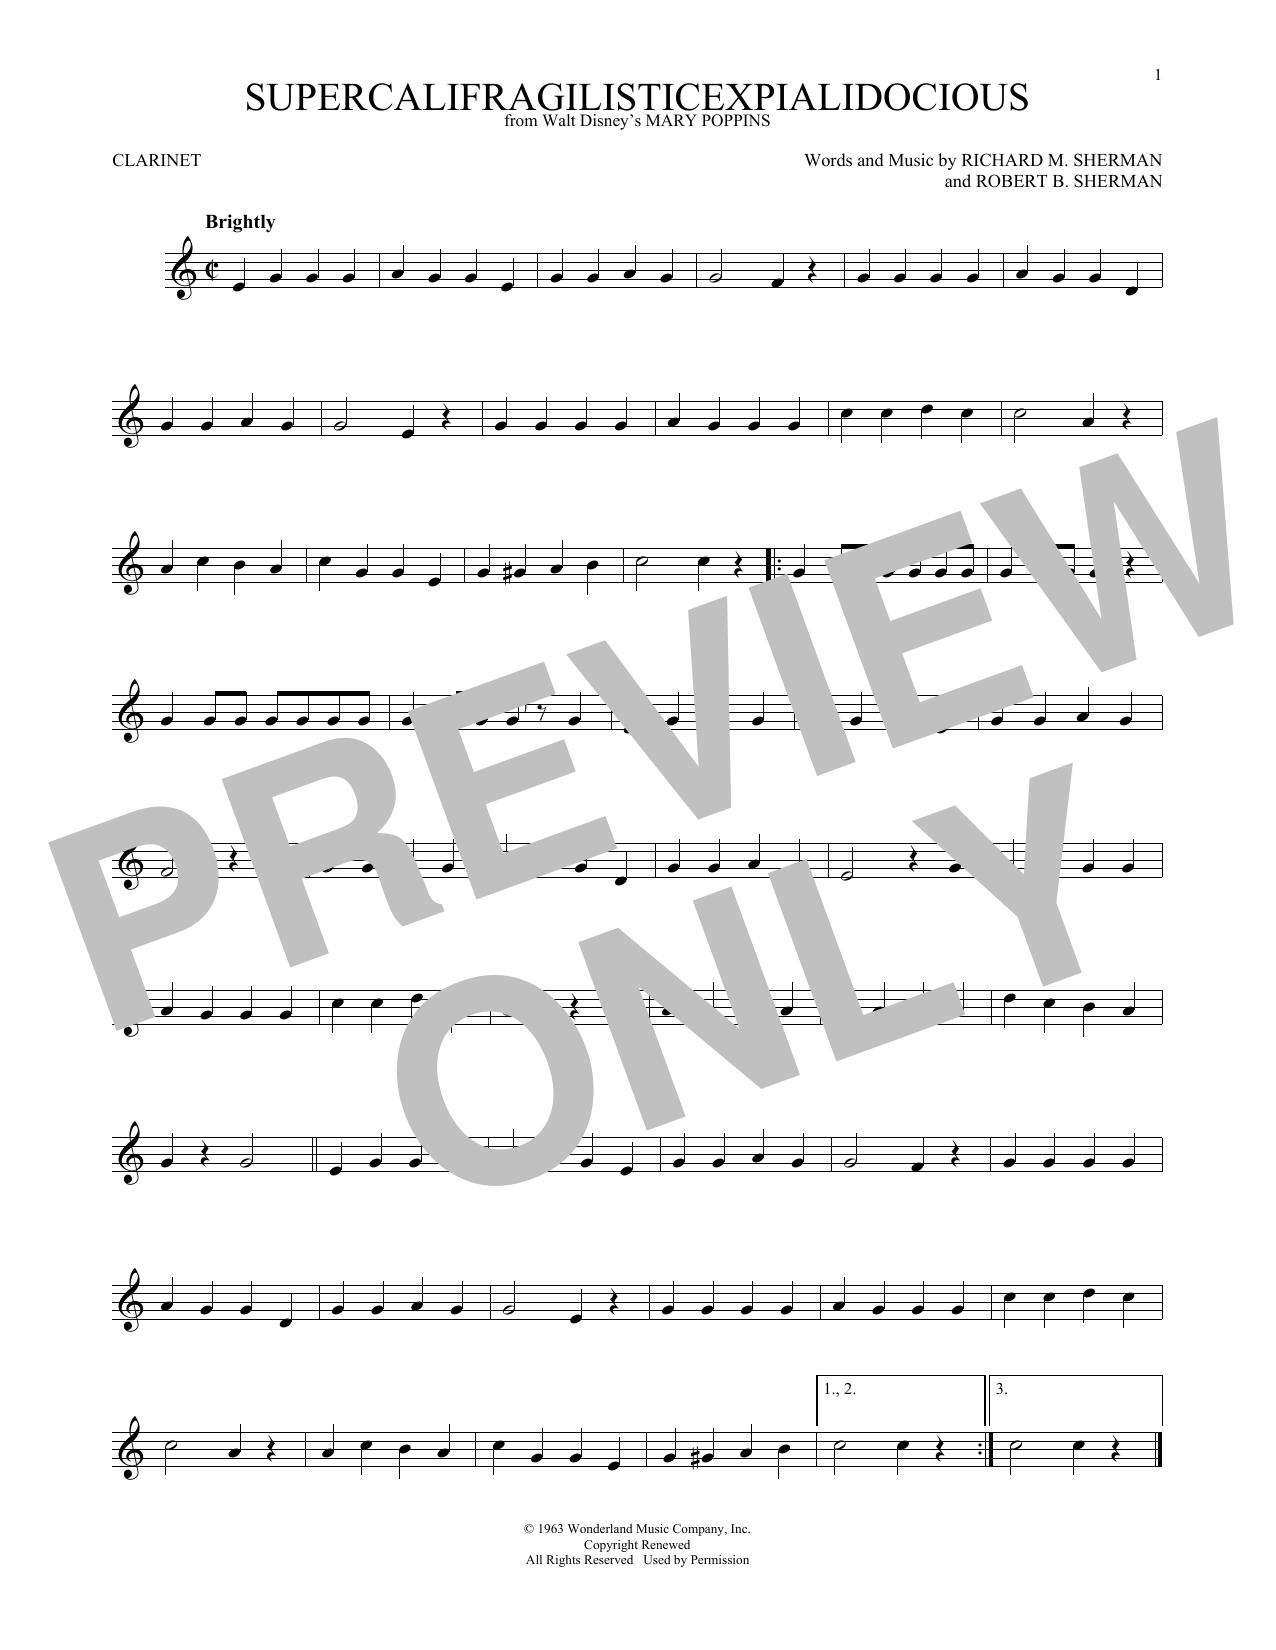 Supercalifragilisticexpialidocious (from Mary Poppins) (Clarinet Solo)